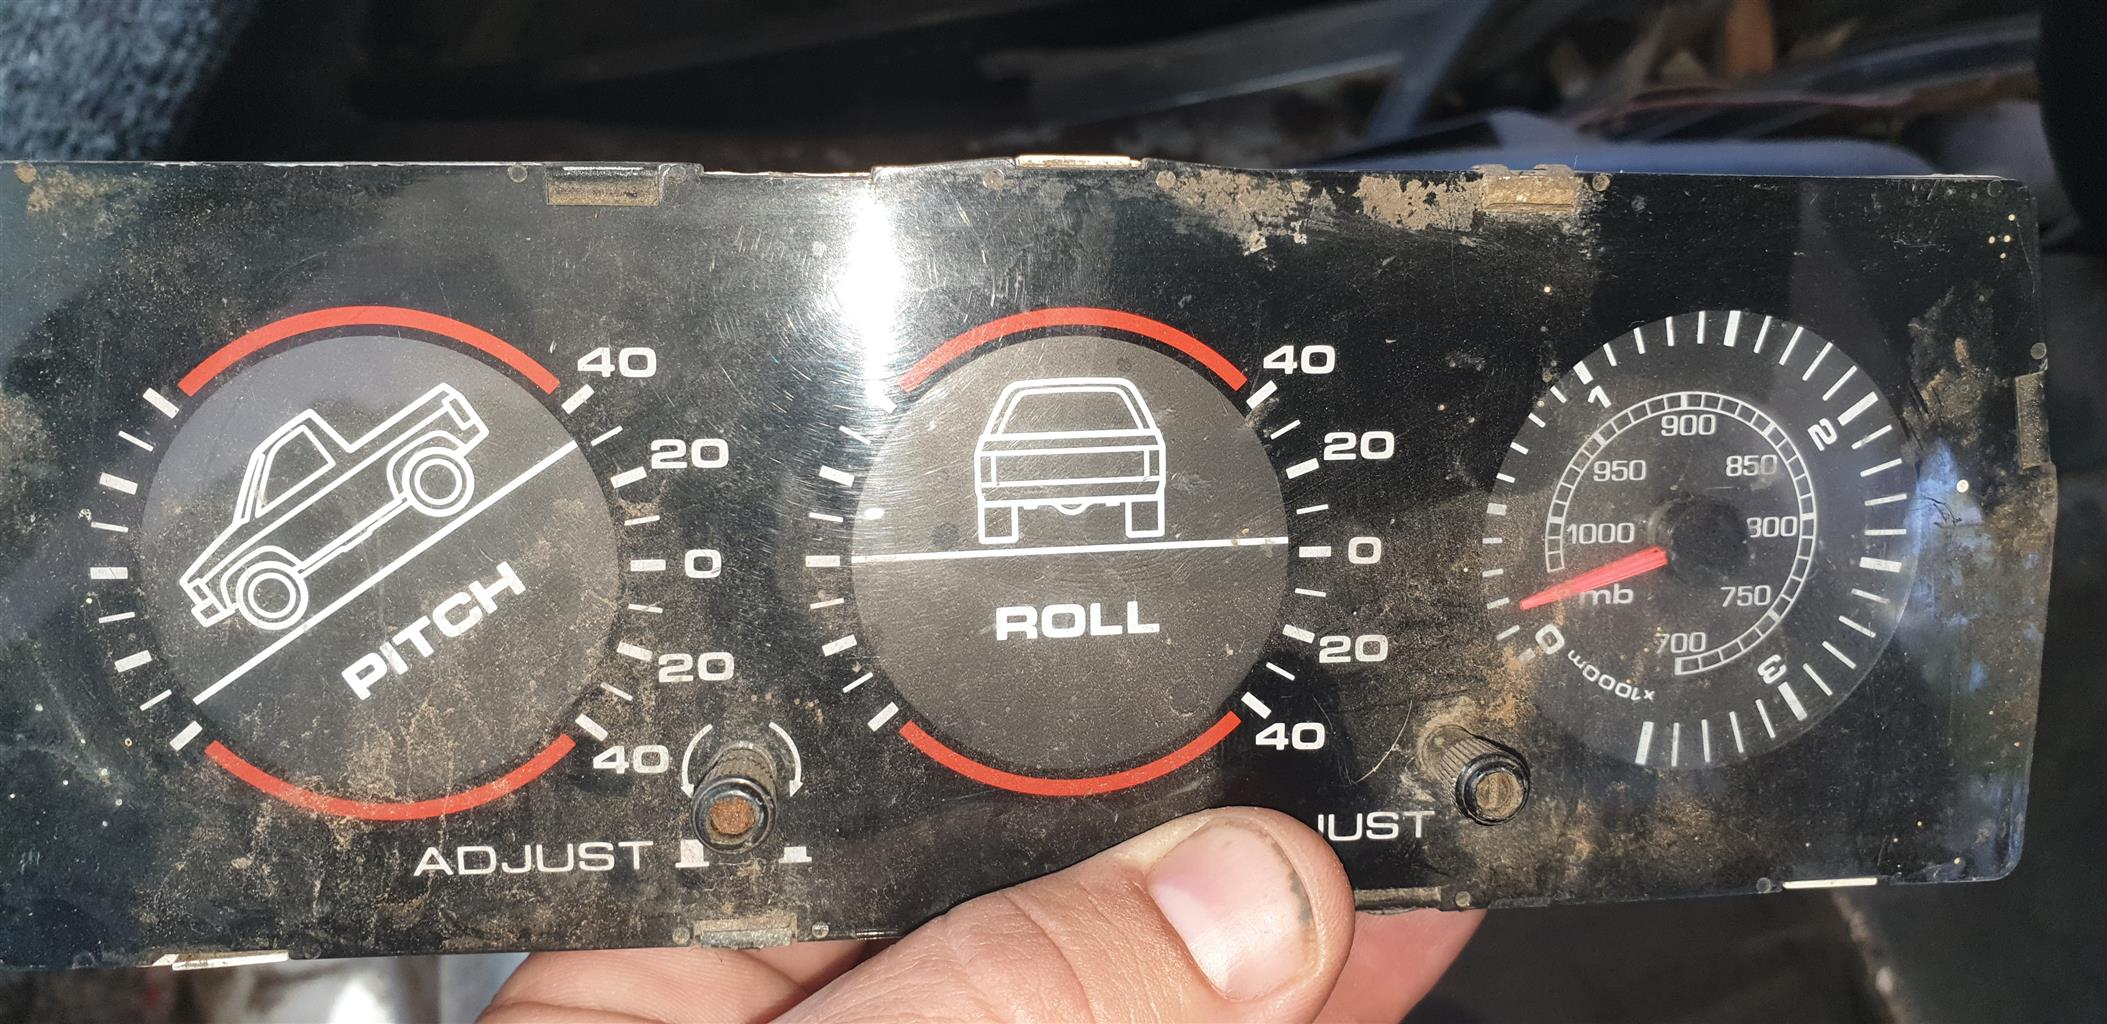 1995 Nissan Sani